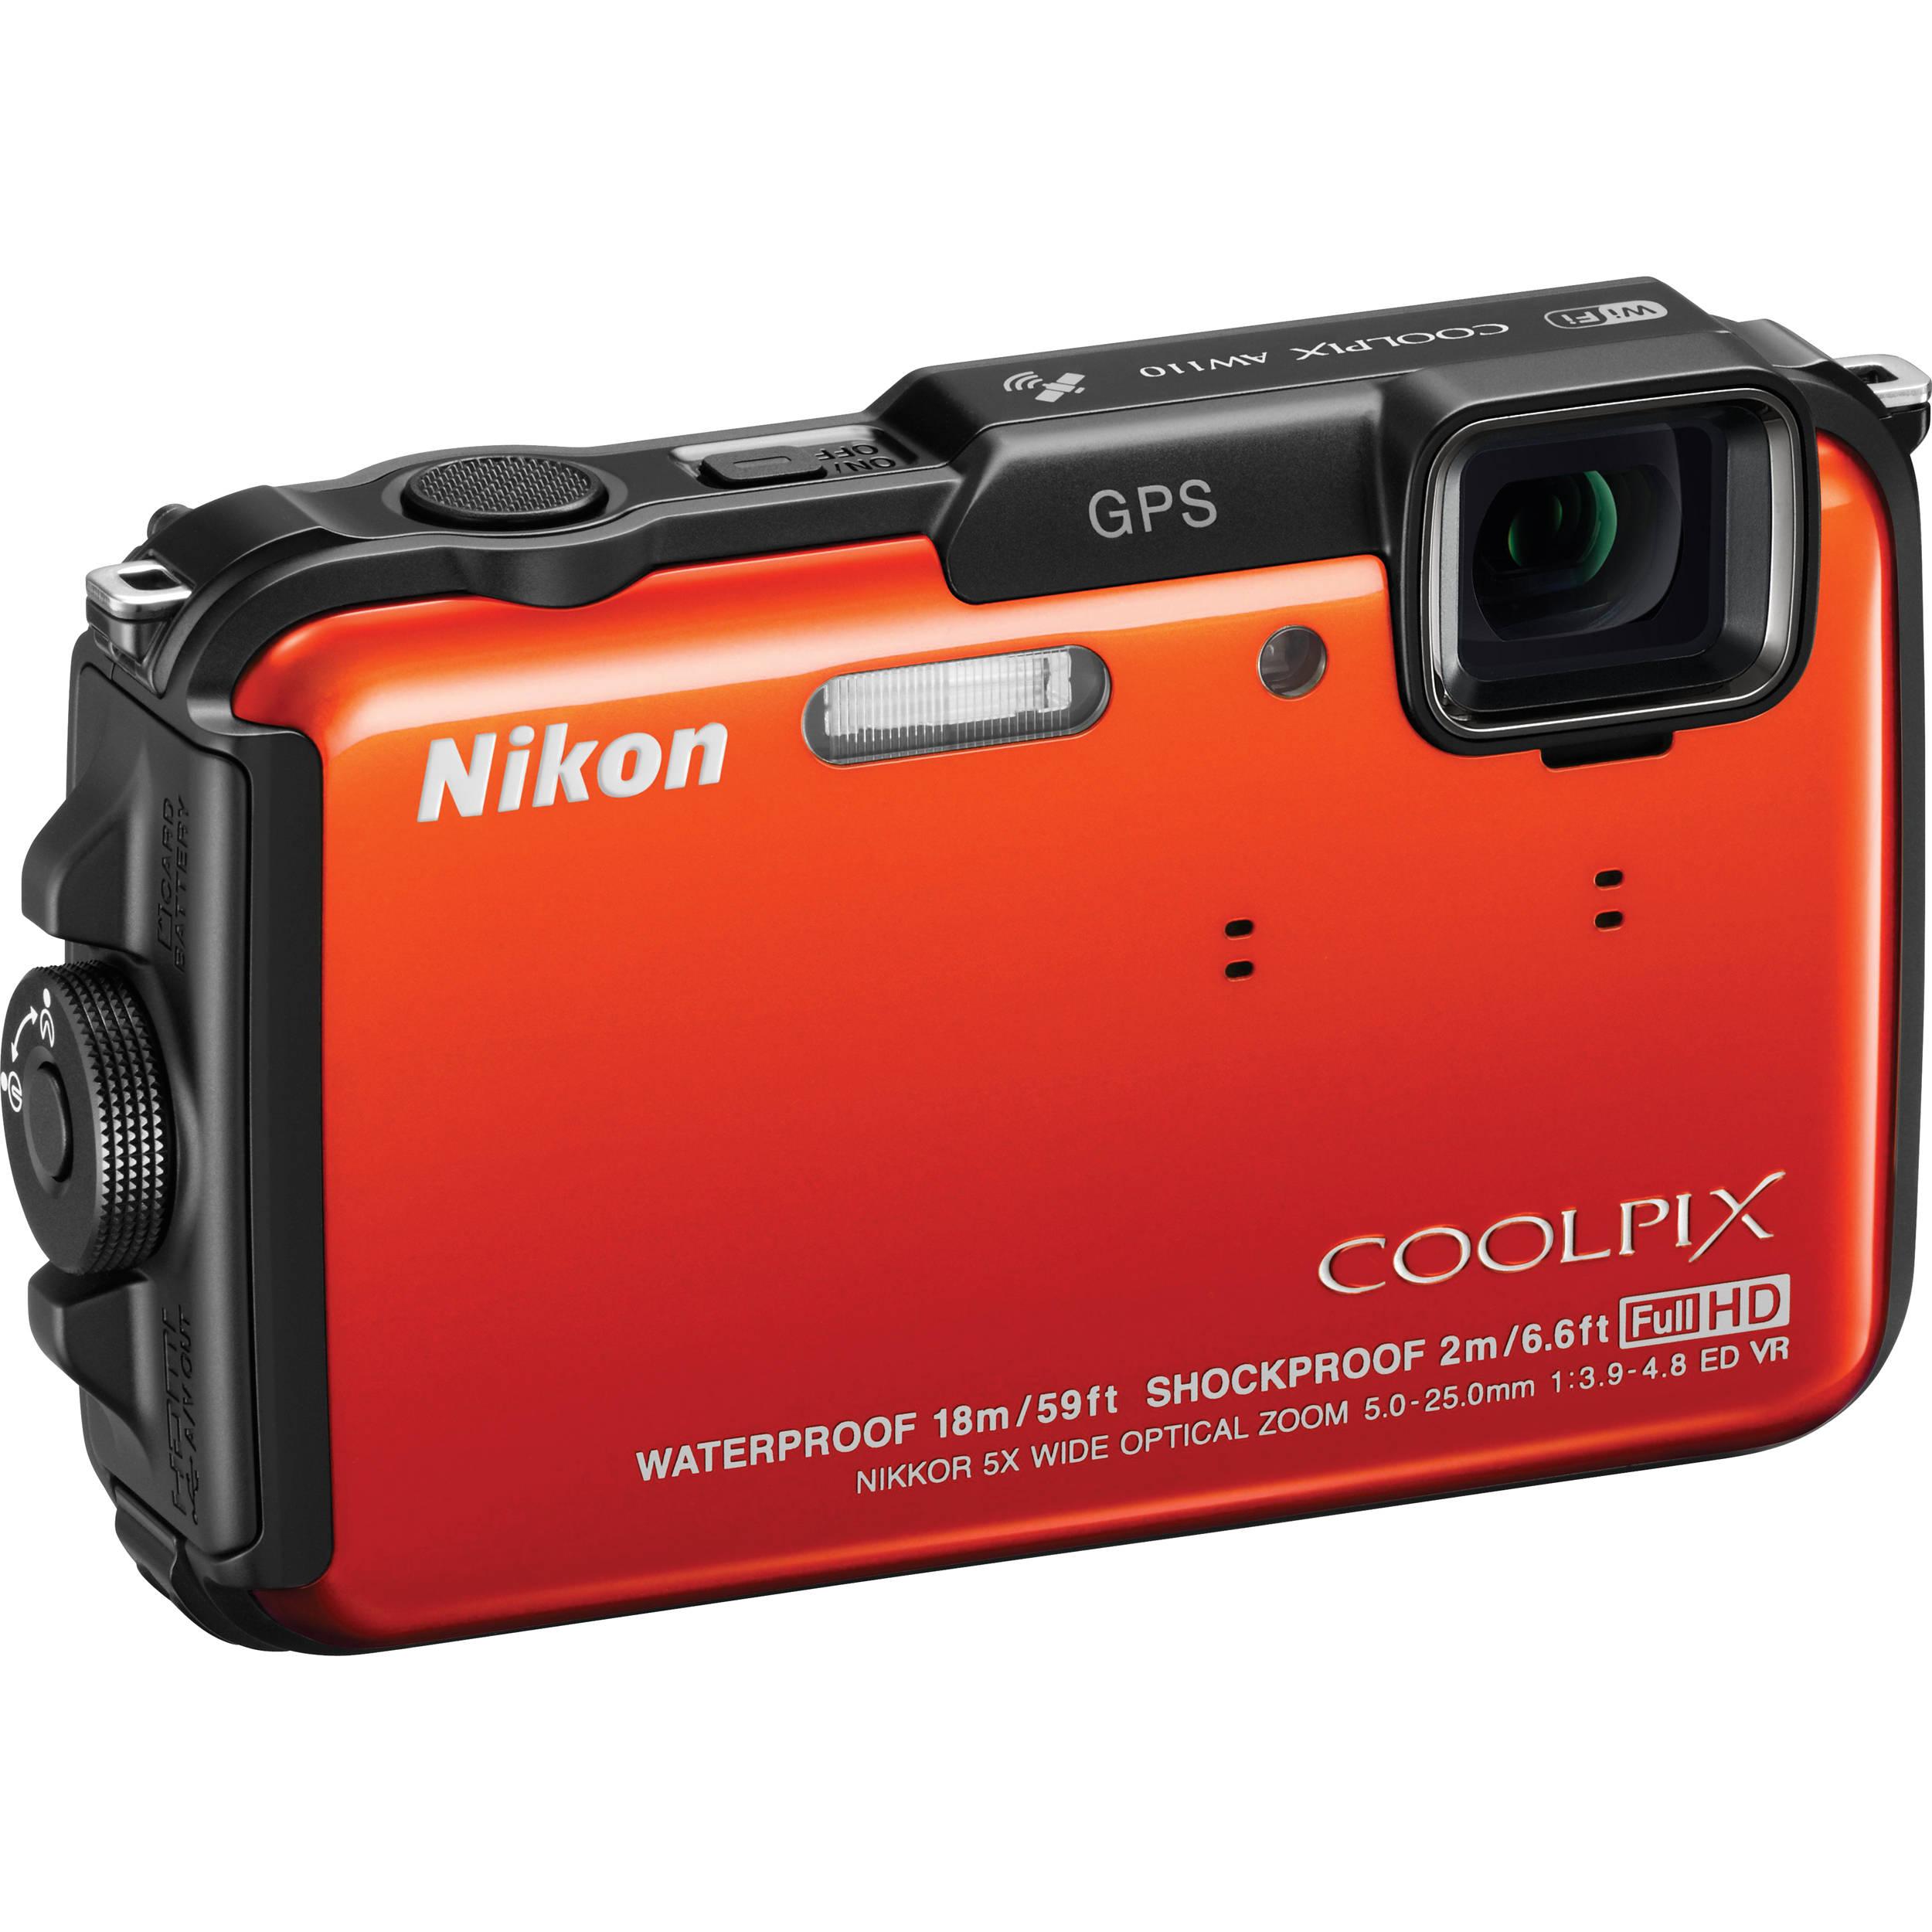 nikon coolpix aw110 digital camera orange 26412 b h photo rh bhphotovideo com nikon aw110 manuale italiano nikon aw110 manuale italiano